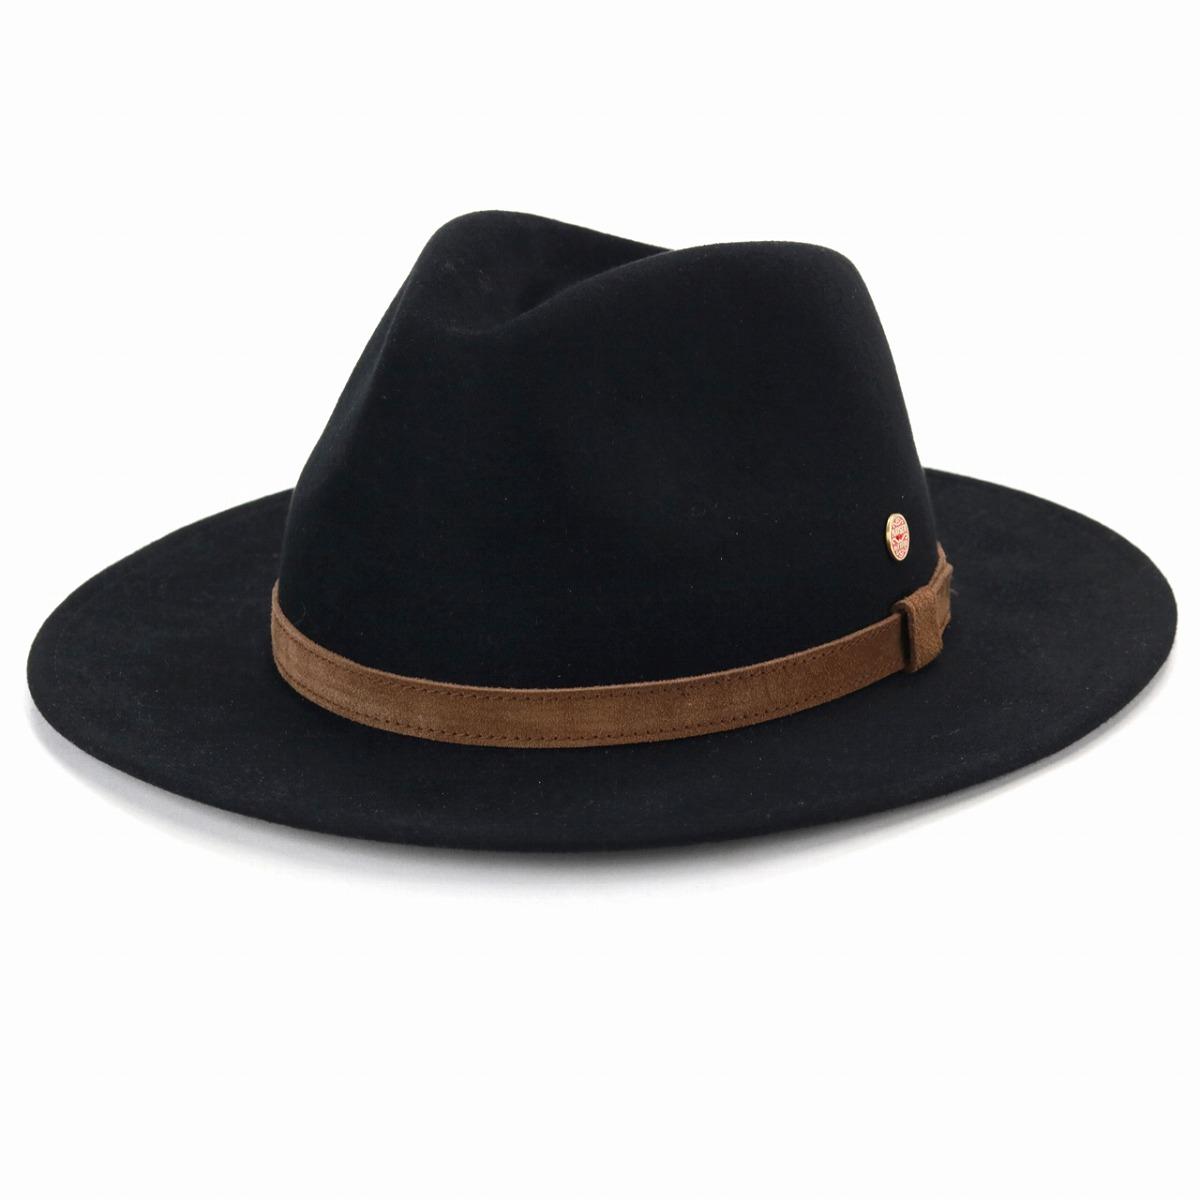 d576f6be0a2 Black. A brand MAYSER. Y ditch rim suede genuine leather hat soft felt ...